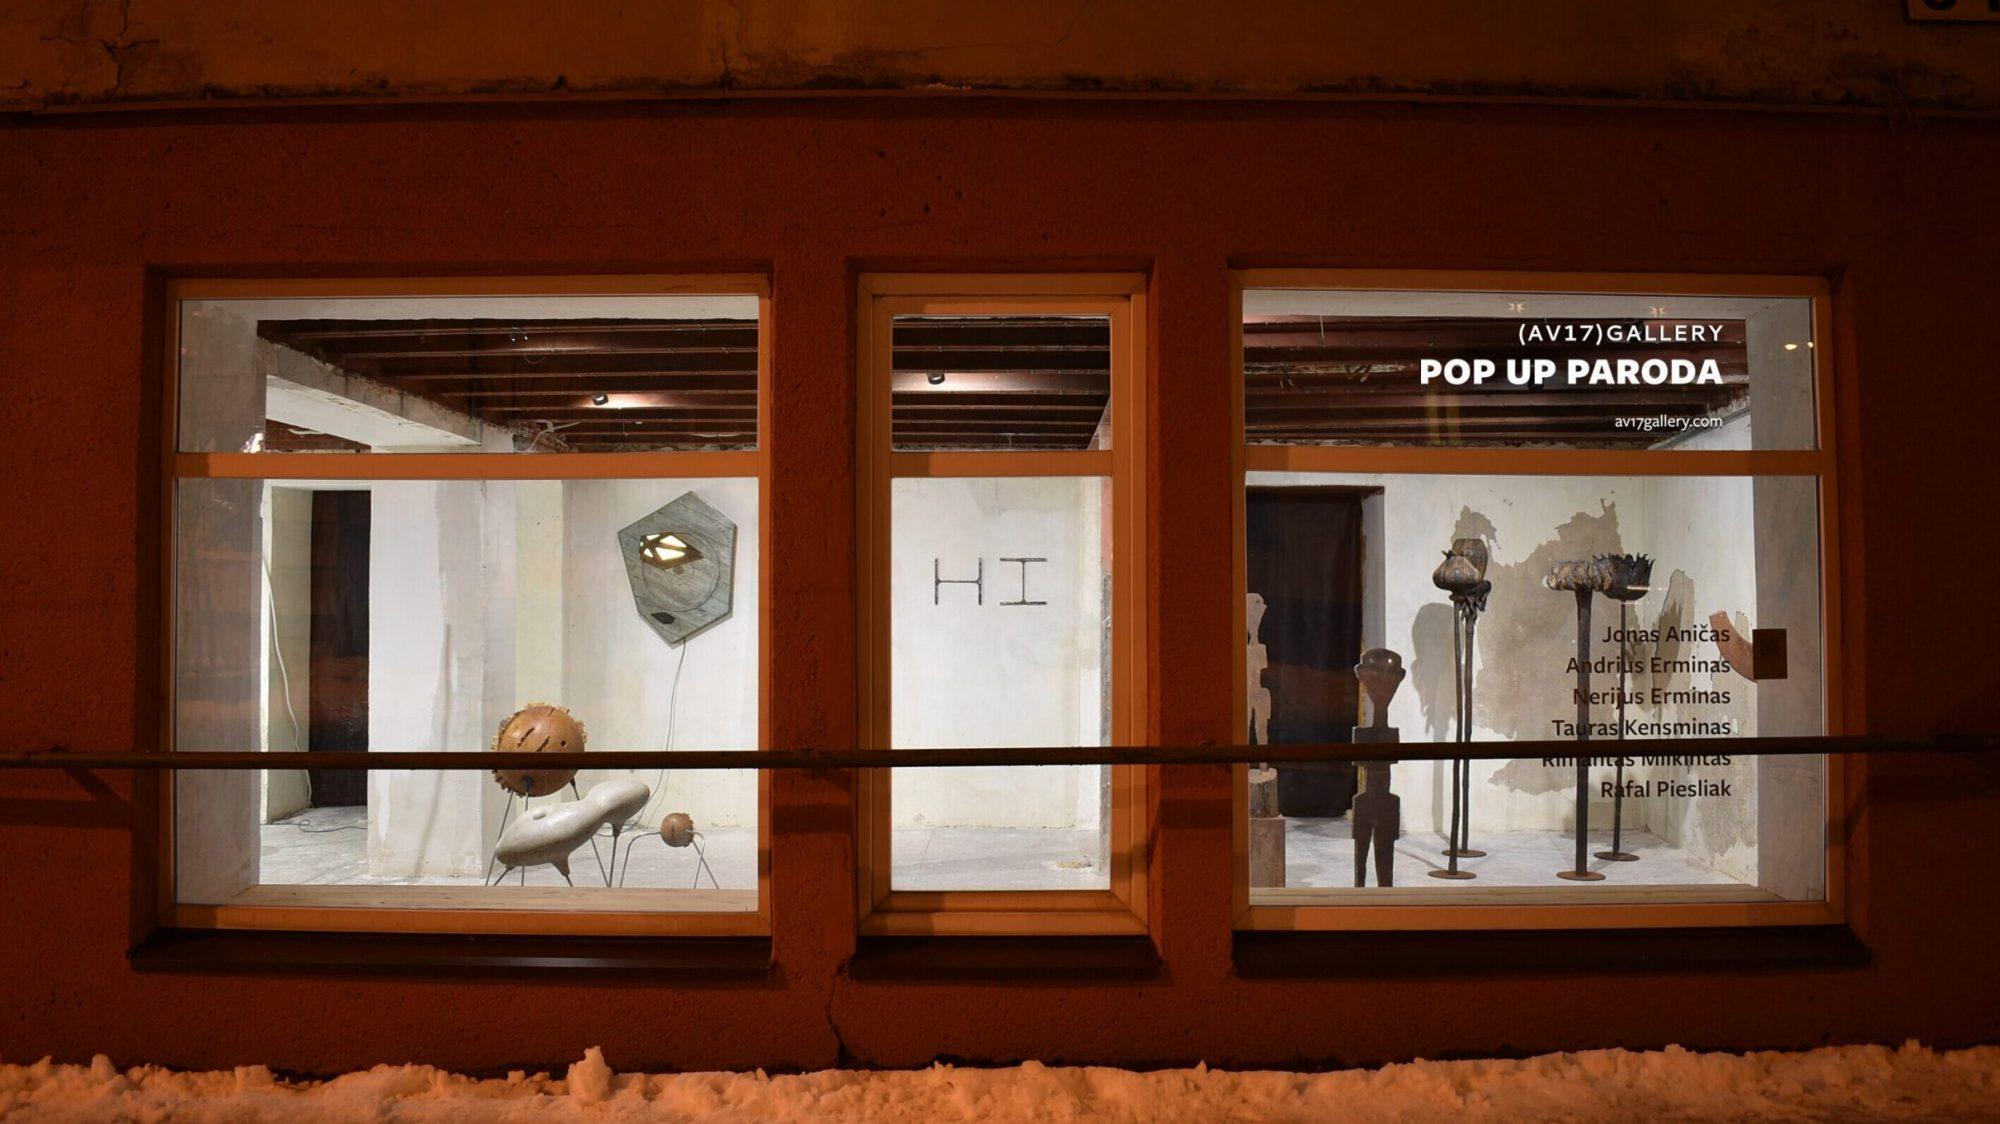 Vitrinoje Pylimo gatvėje – galerijos (AV17) paroda